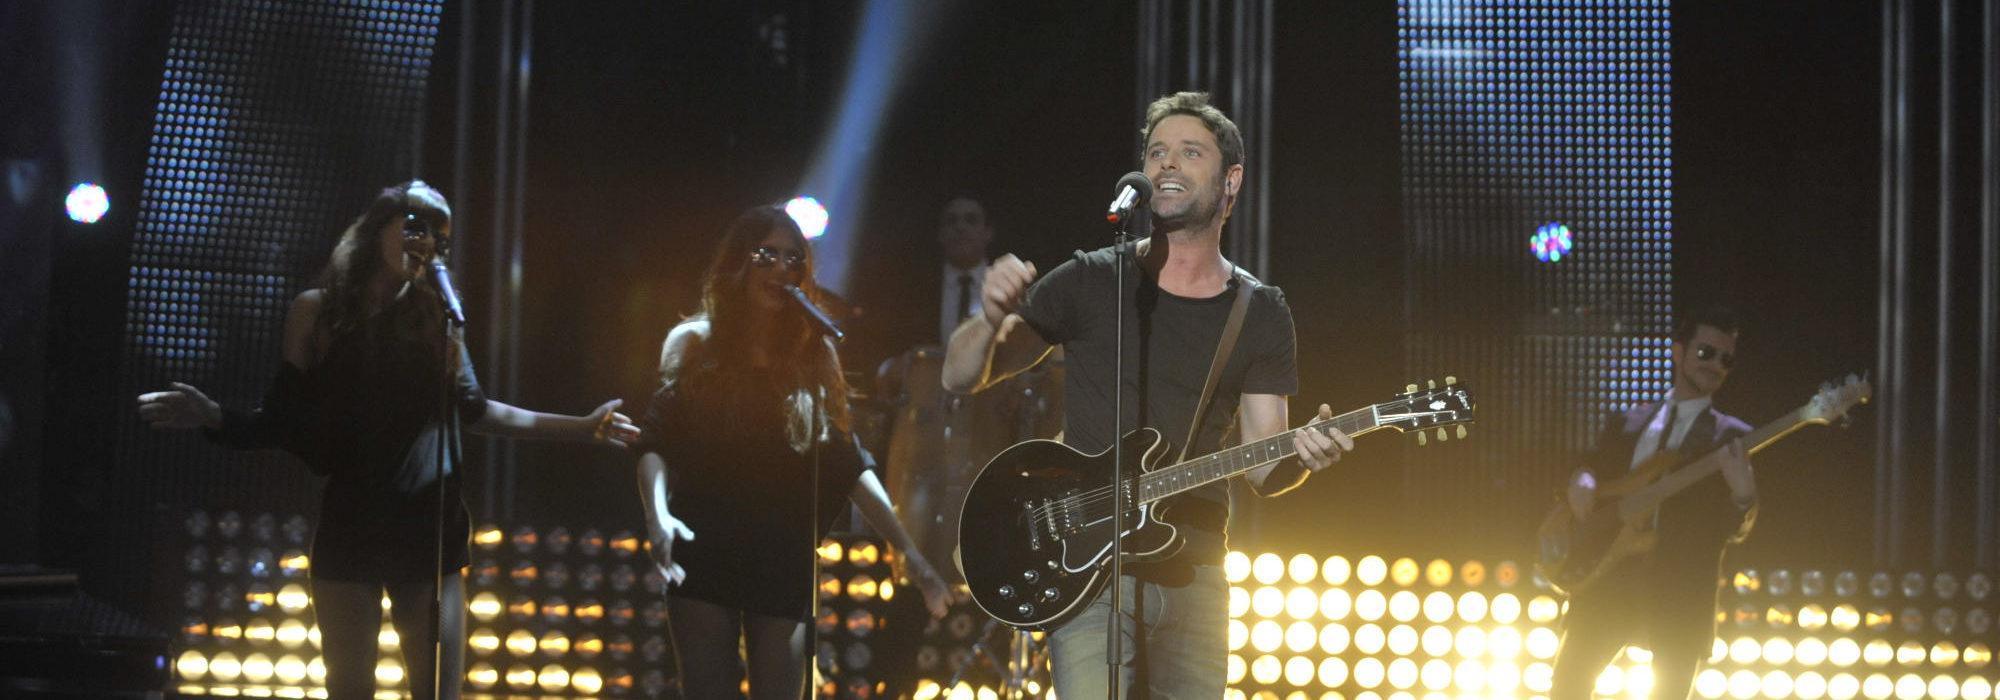 El pasado de David Ascanio como jurado de 'Destino Eurovisión' en 2011 y la polémica de Lucía Pérez